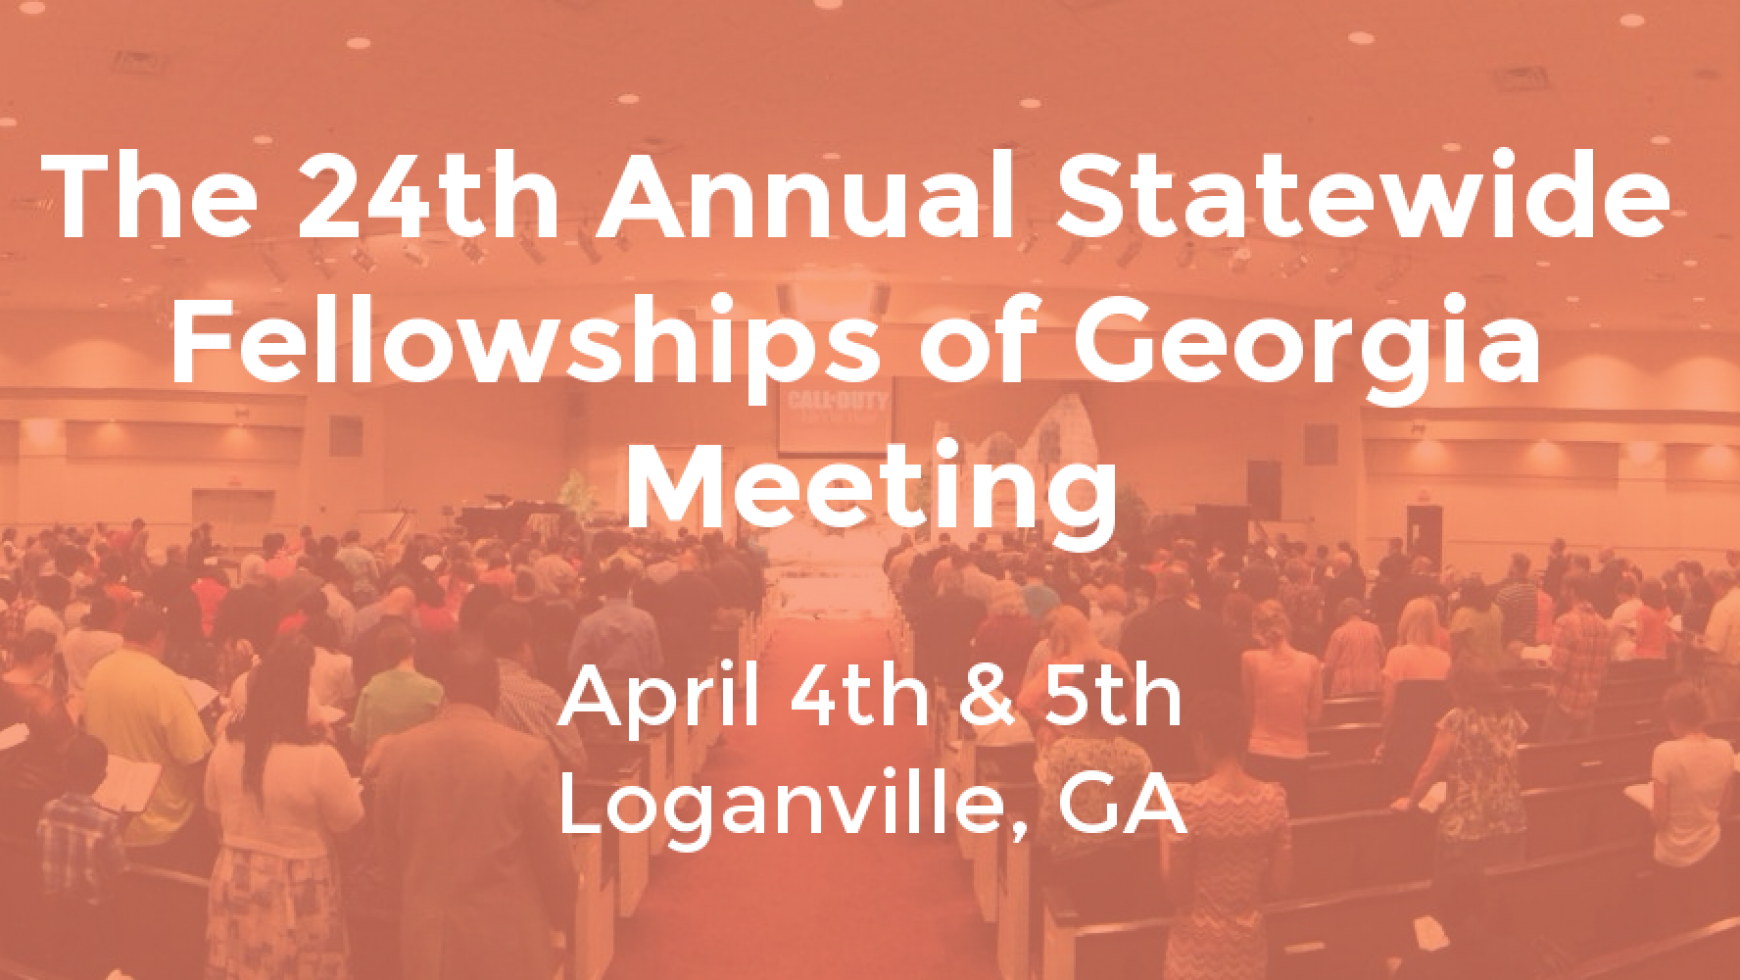 2016 IBFGA – 24th Annual Statewide Fellowship Meeting at Corinth Baptist Church in Loganville, GA